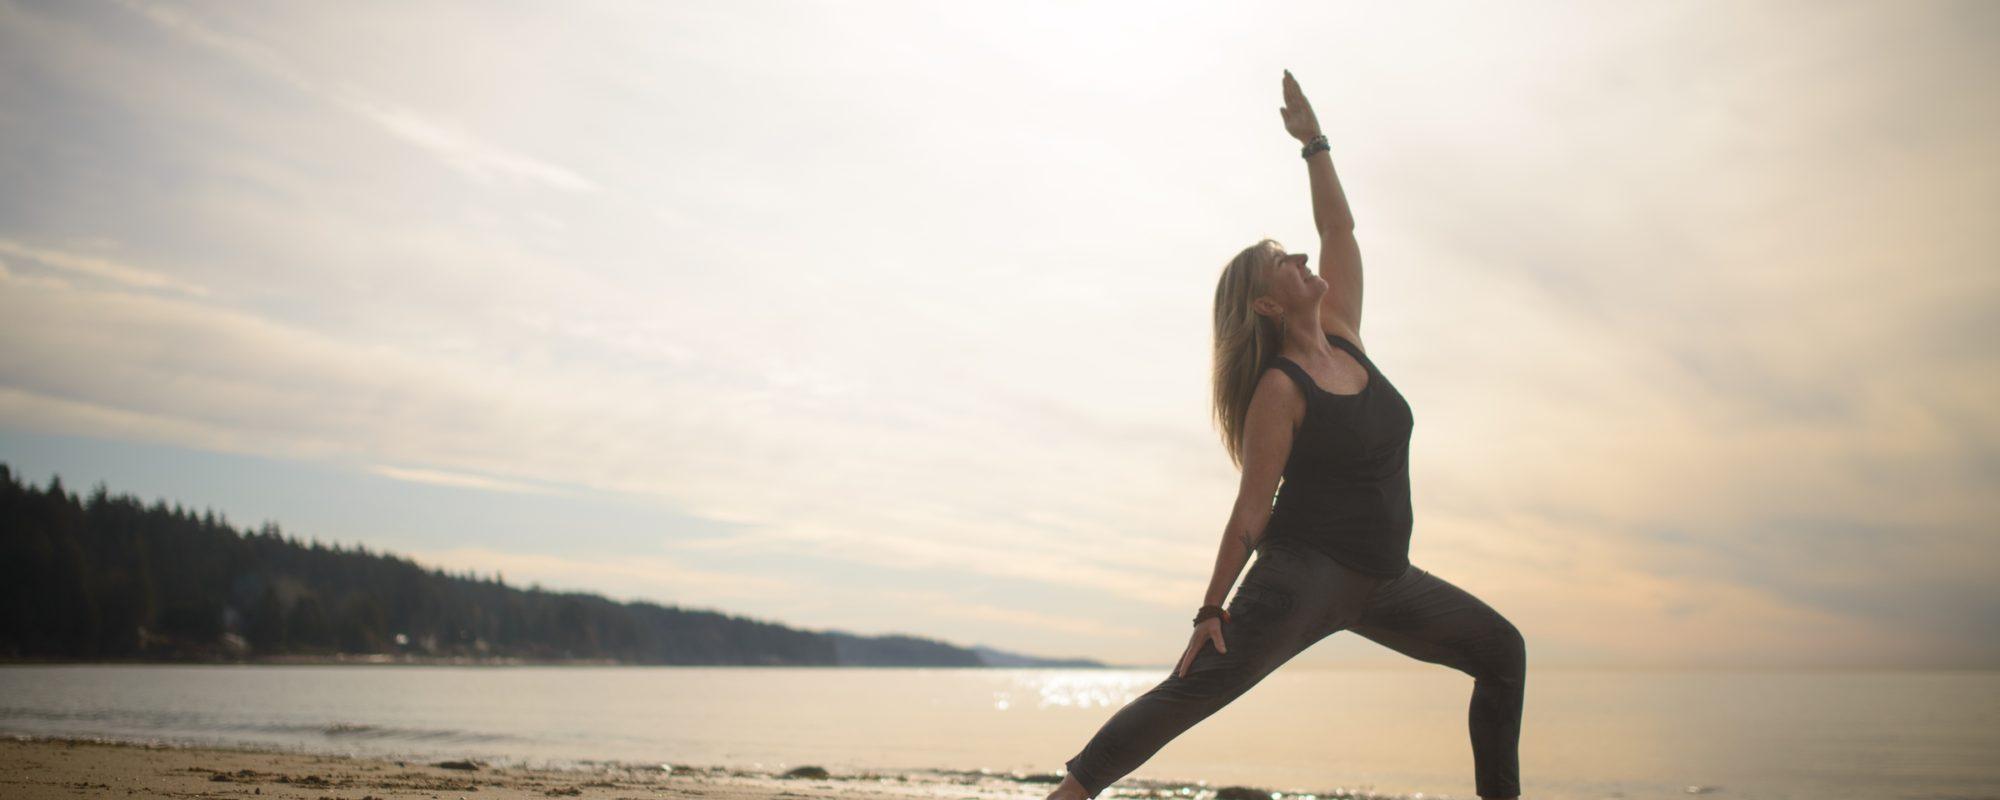 Yoga on the beach in Roberts Creek